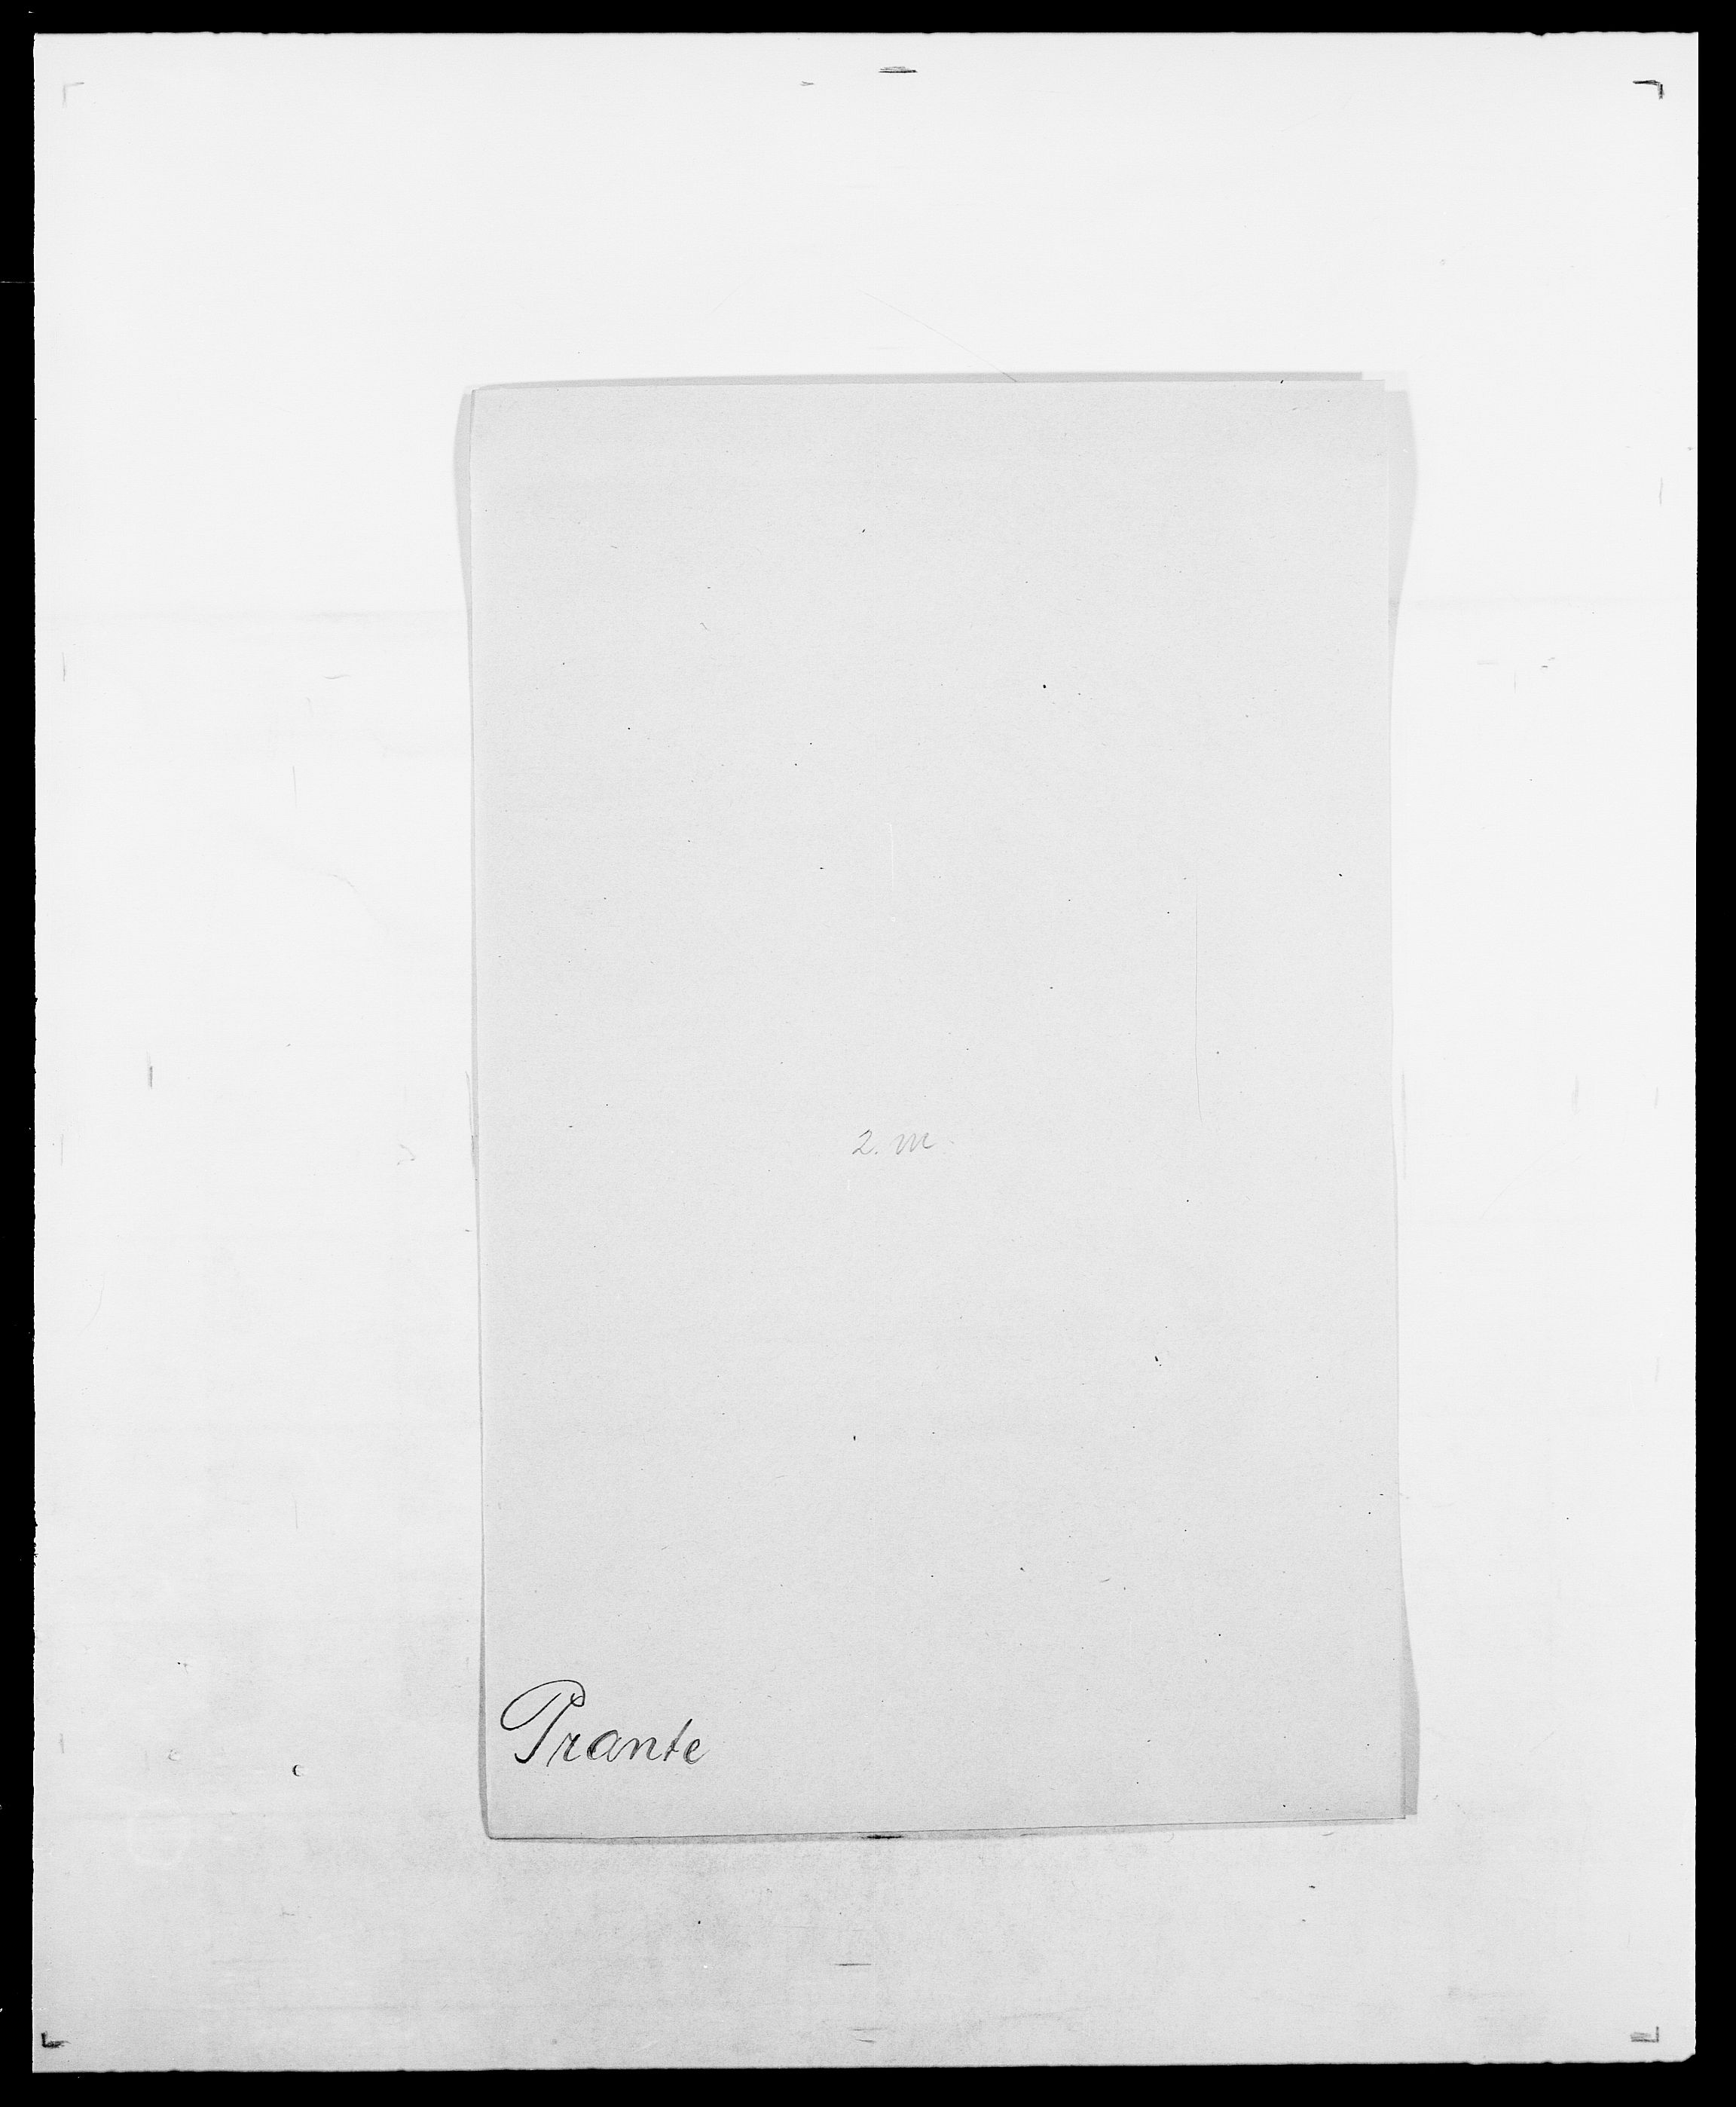 SAO, Delgobe, Charles Antoine - samling, D/Da/L0031: de Place - Raaum, s. 296